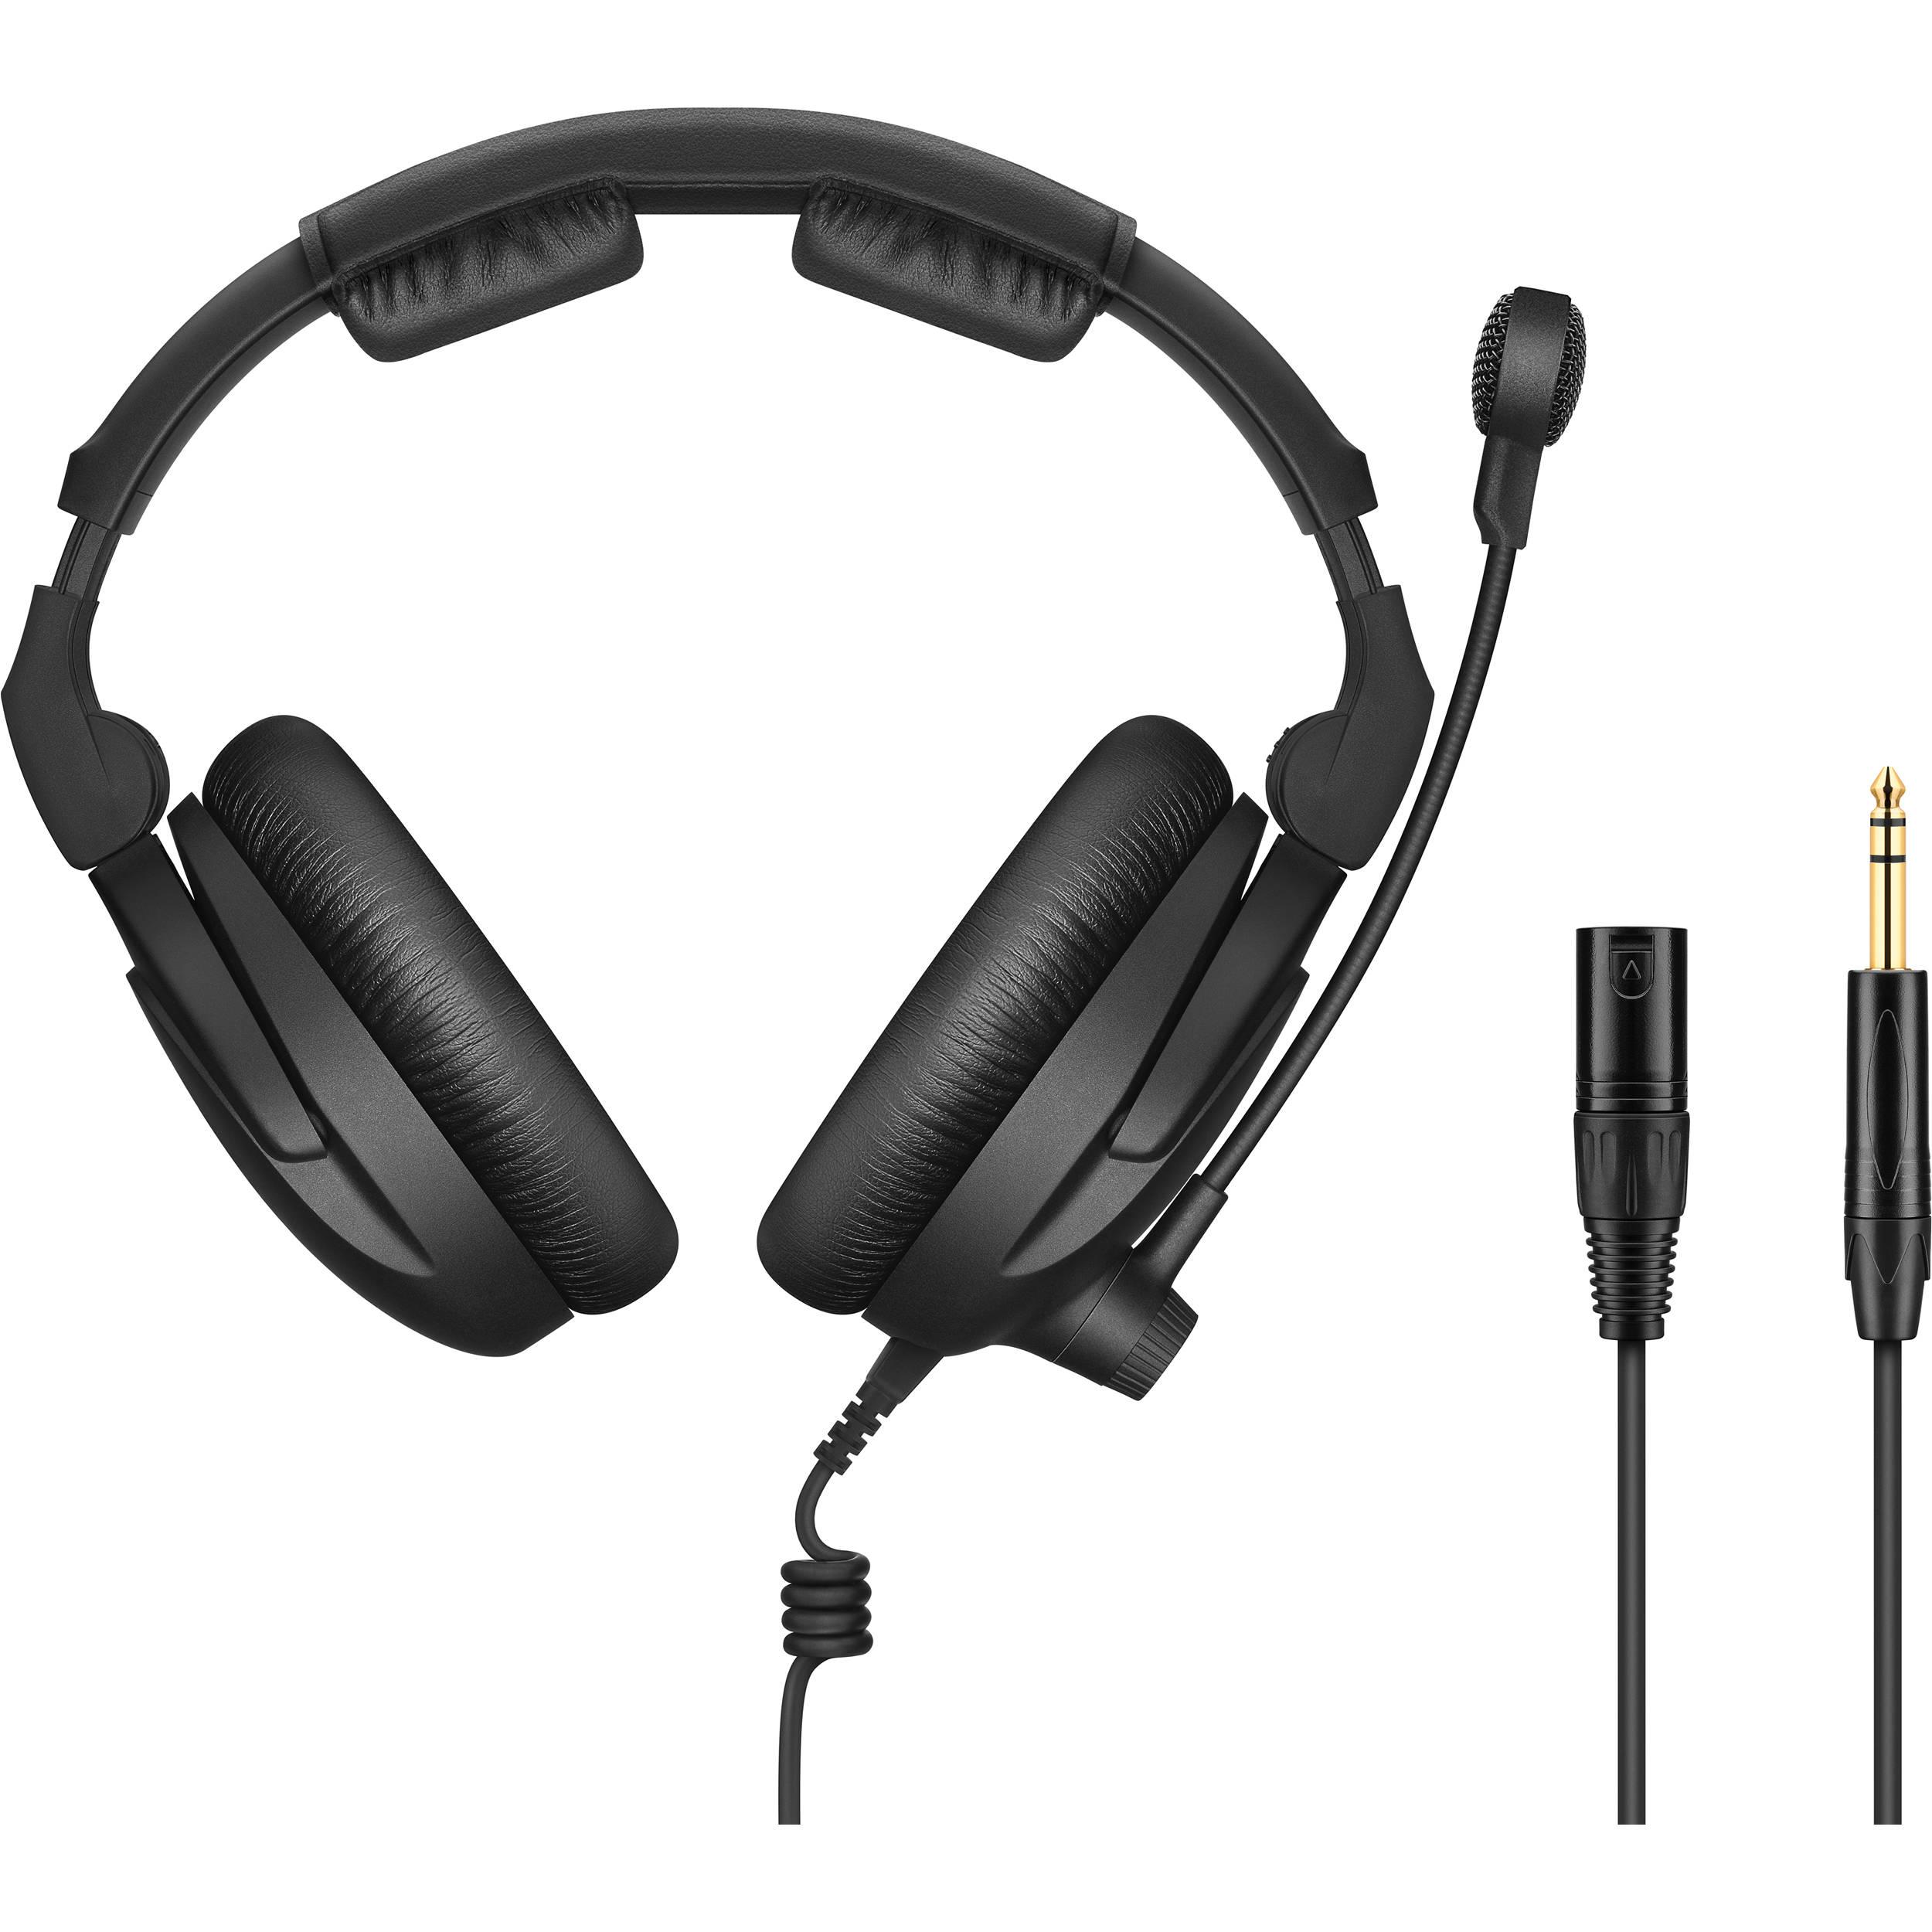 sennheiser hmd 300 xq 2 headset with boom microphone hmd 300. Black Bedroom Furniture Sets. Home Design Ideas